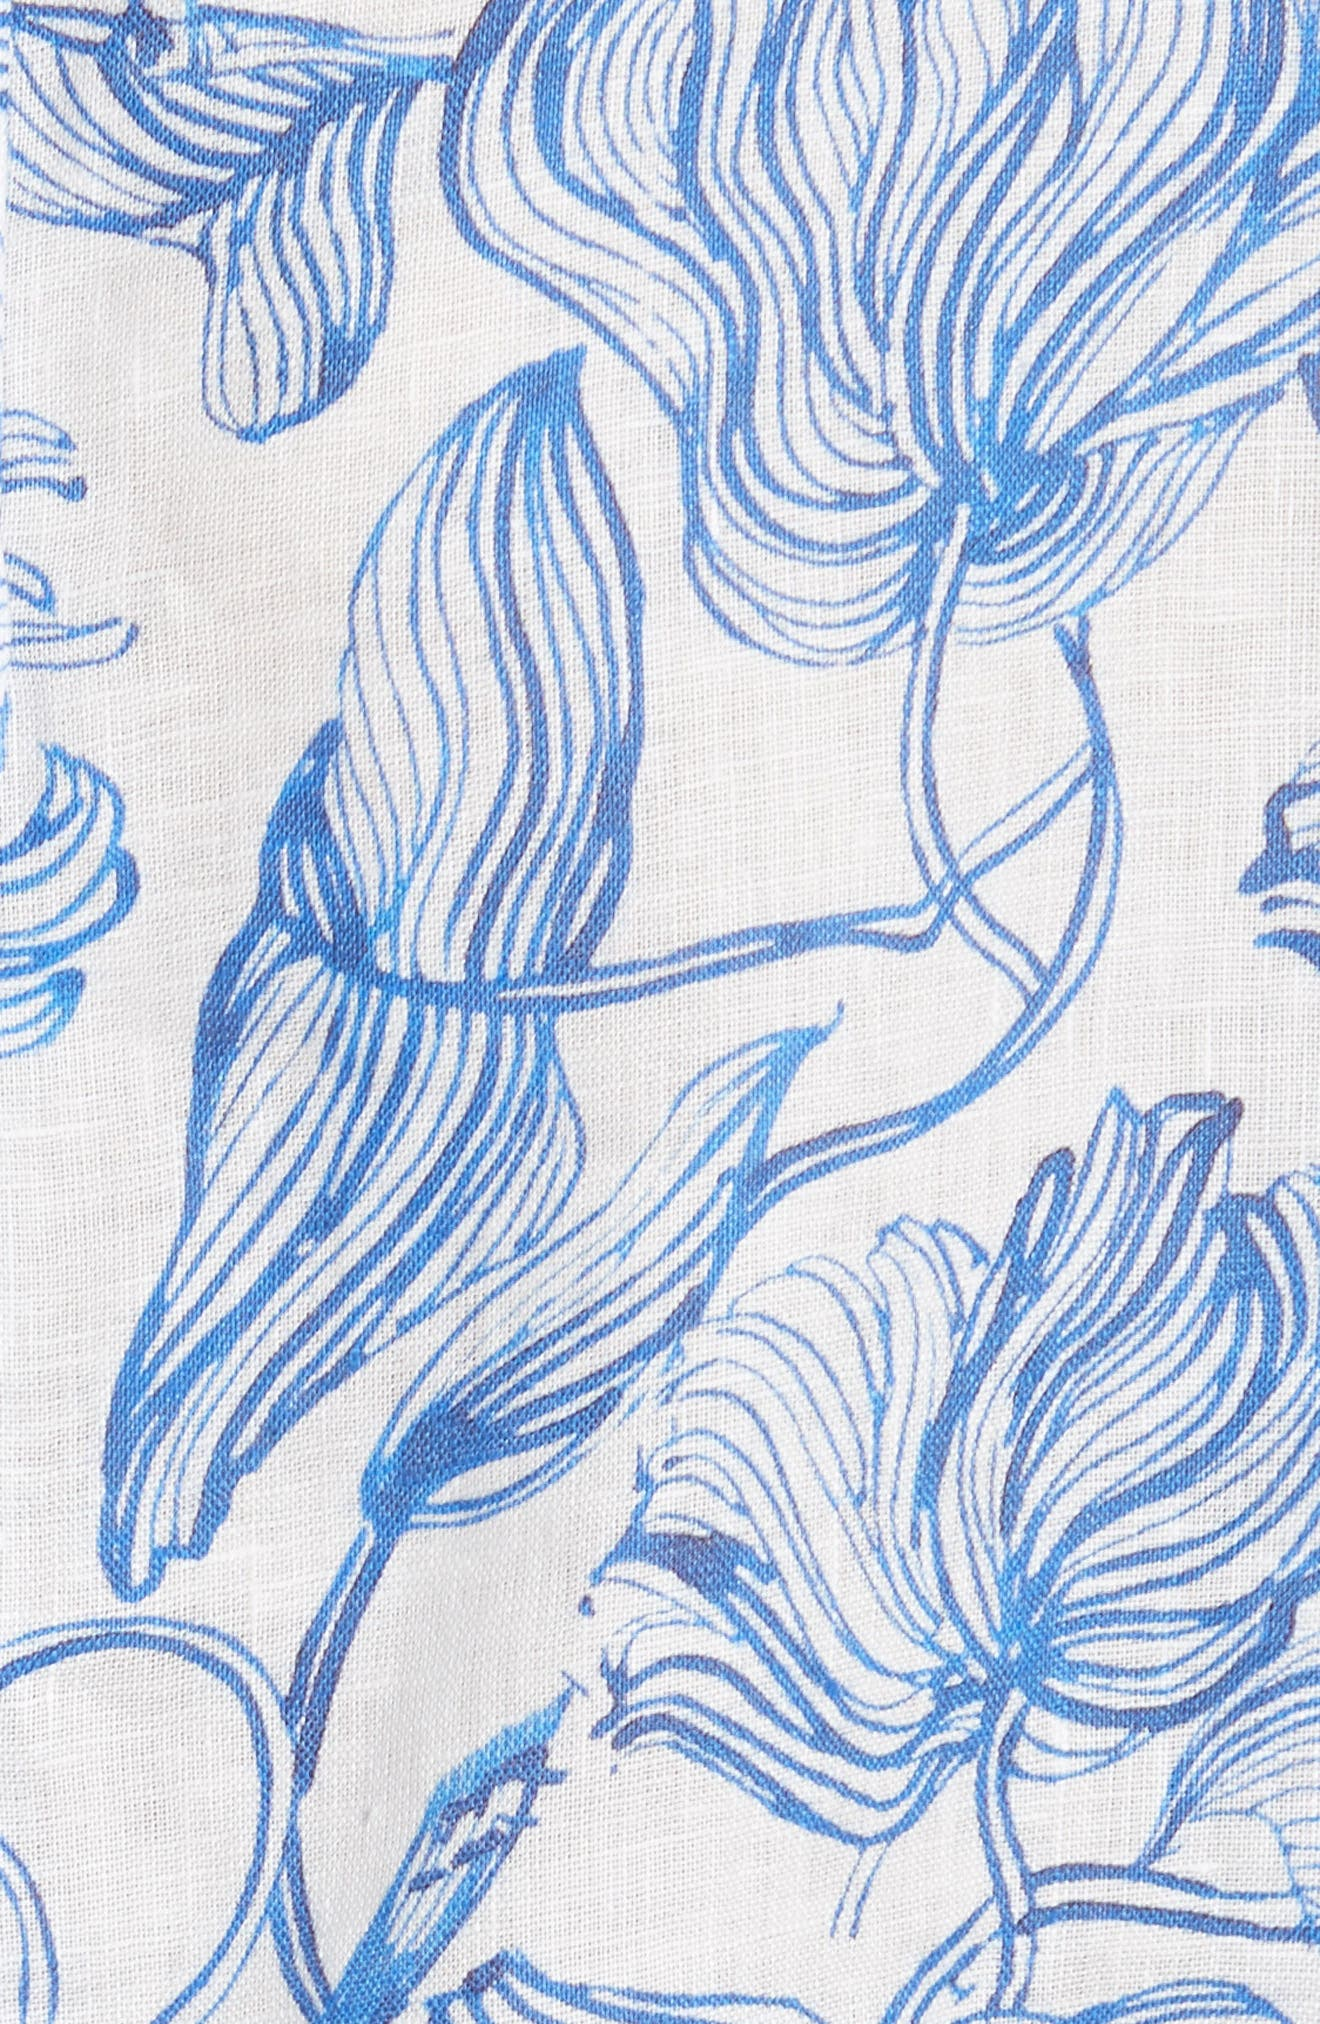 Align Linen Blouse,                             Alternate thumbnail 5, color,                             BLUE